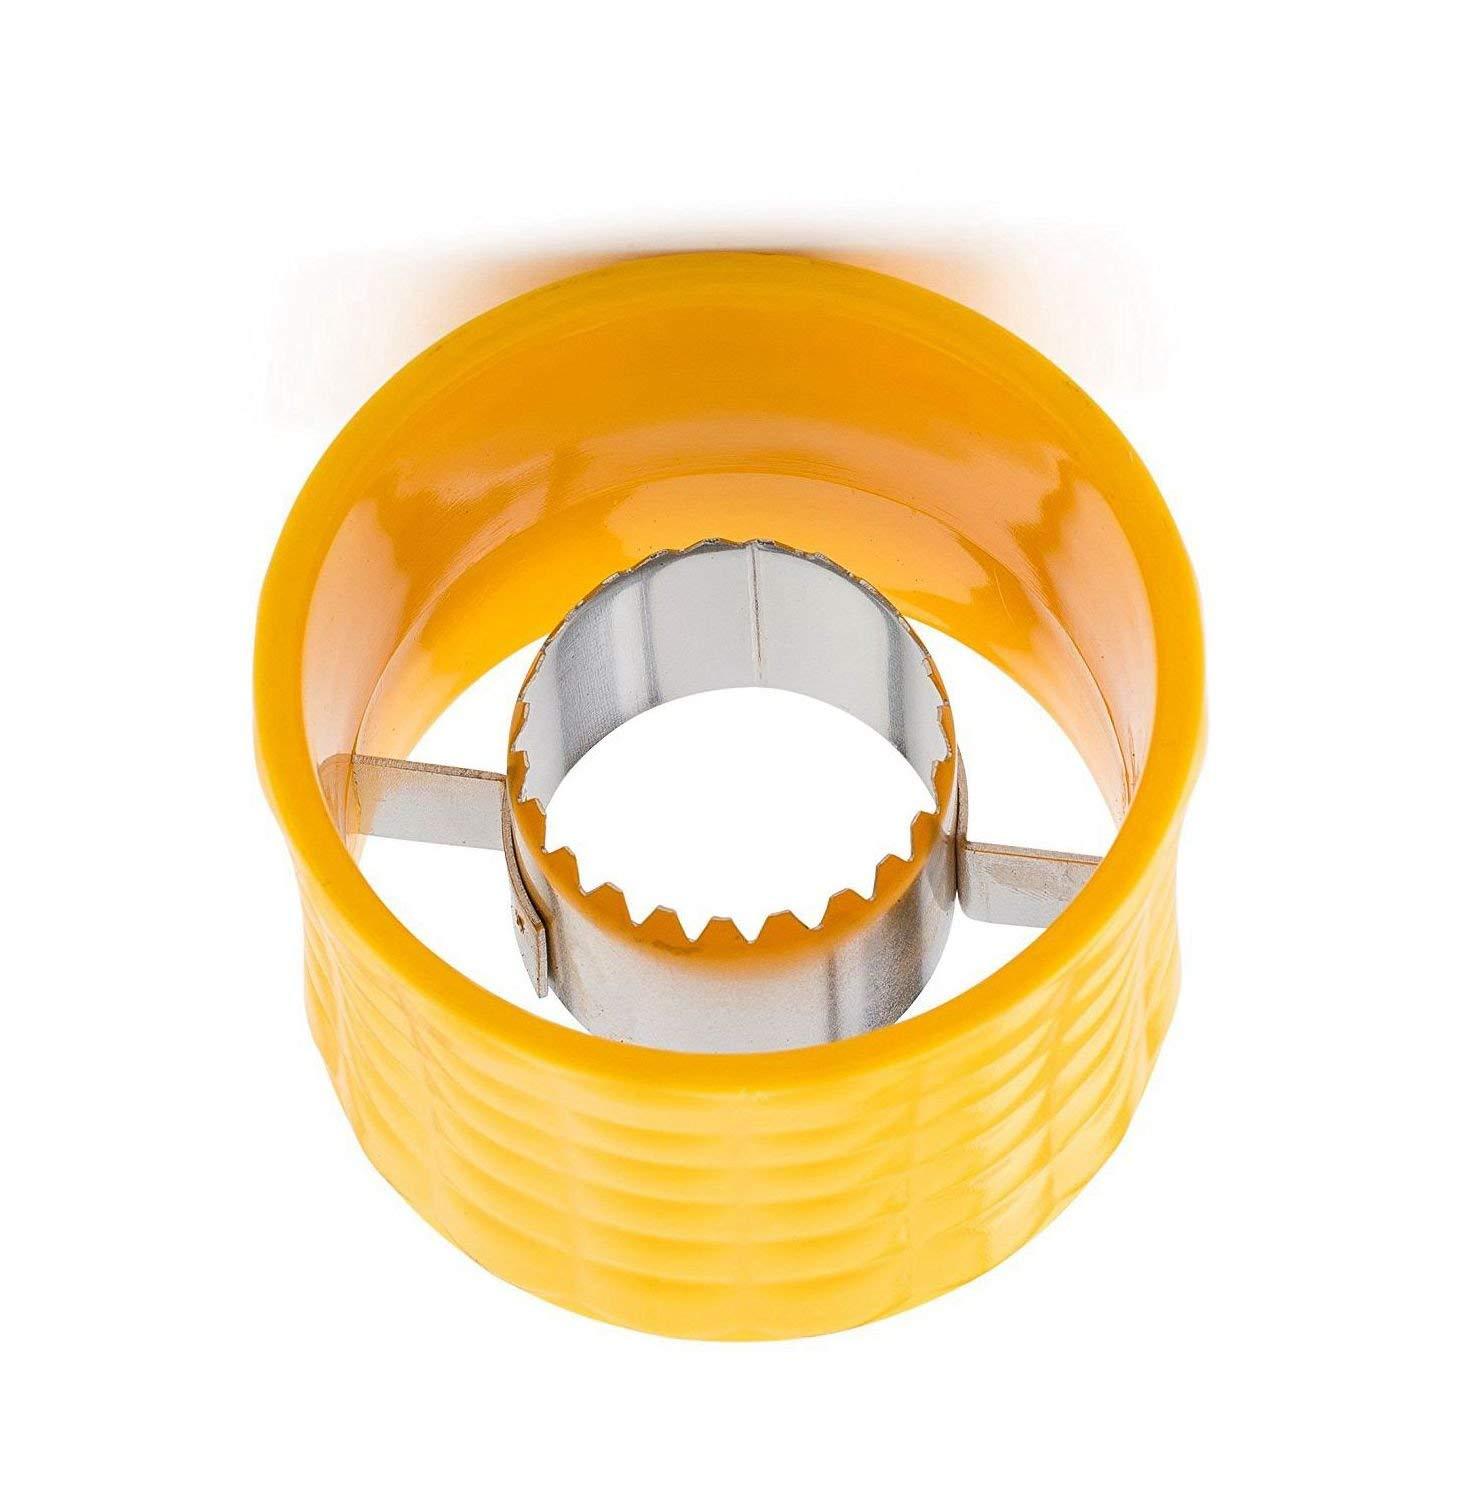 Cob Corn Stripper, Corn Stripping Tool, Manual Circular Threshing Creative Home Kitchen Gadgets